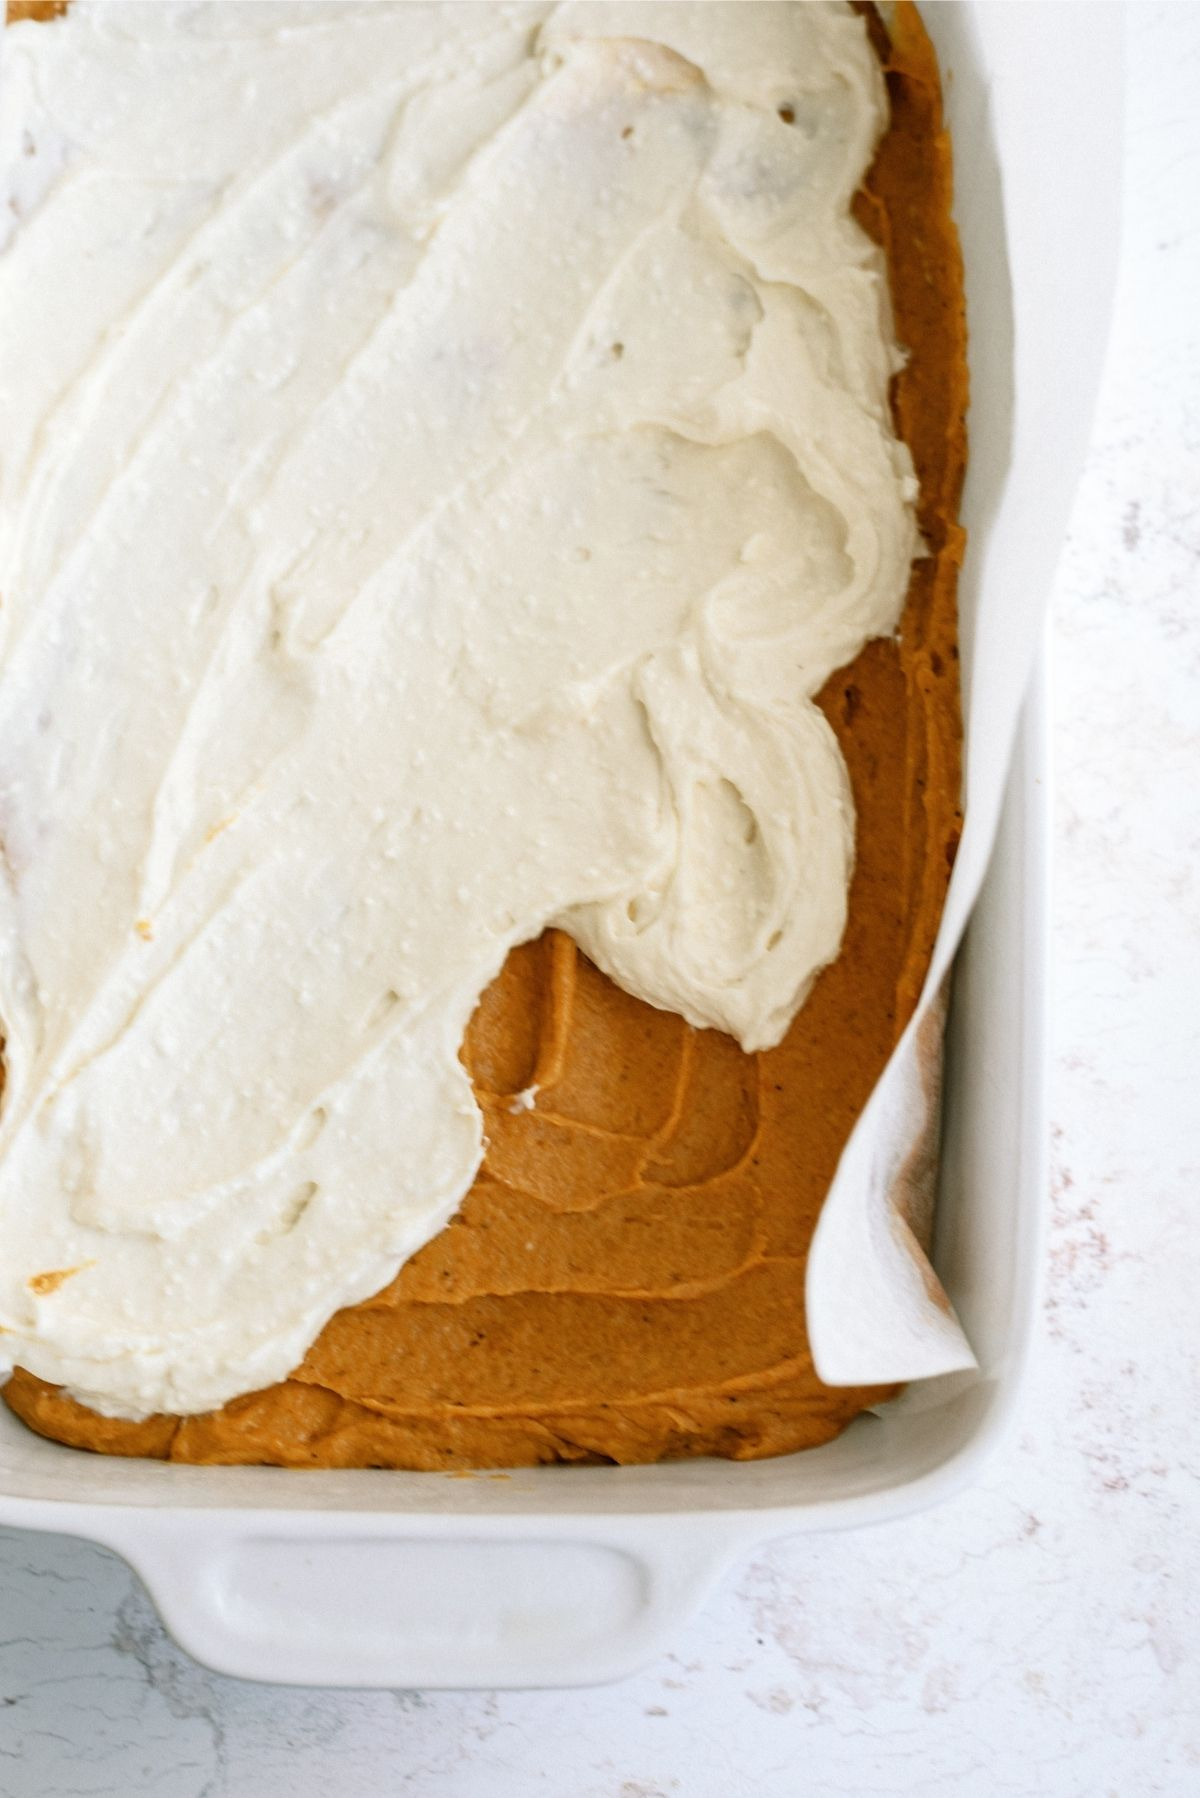 Cream cheese layer spread over bottom pumpkin layer